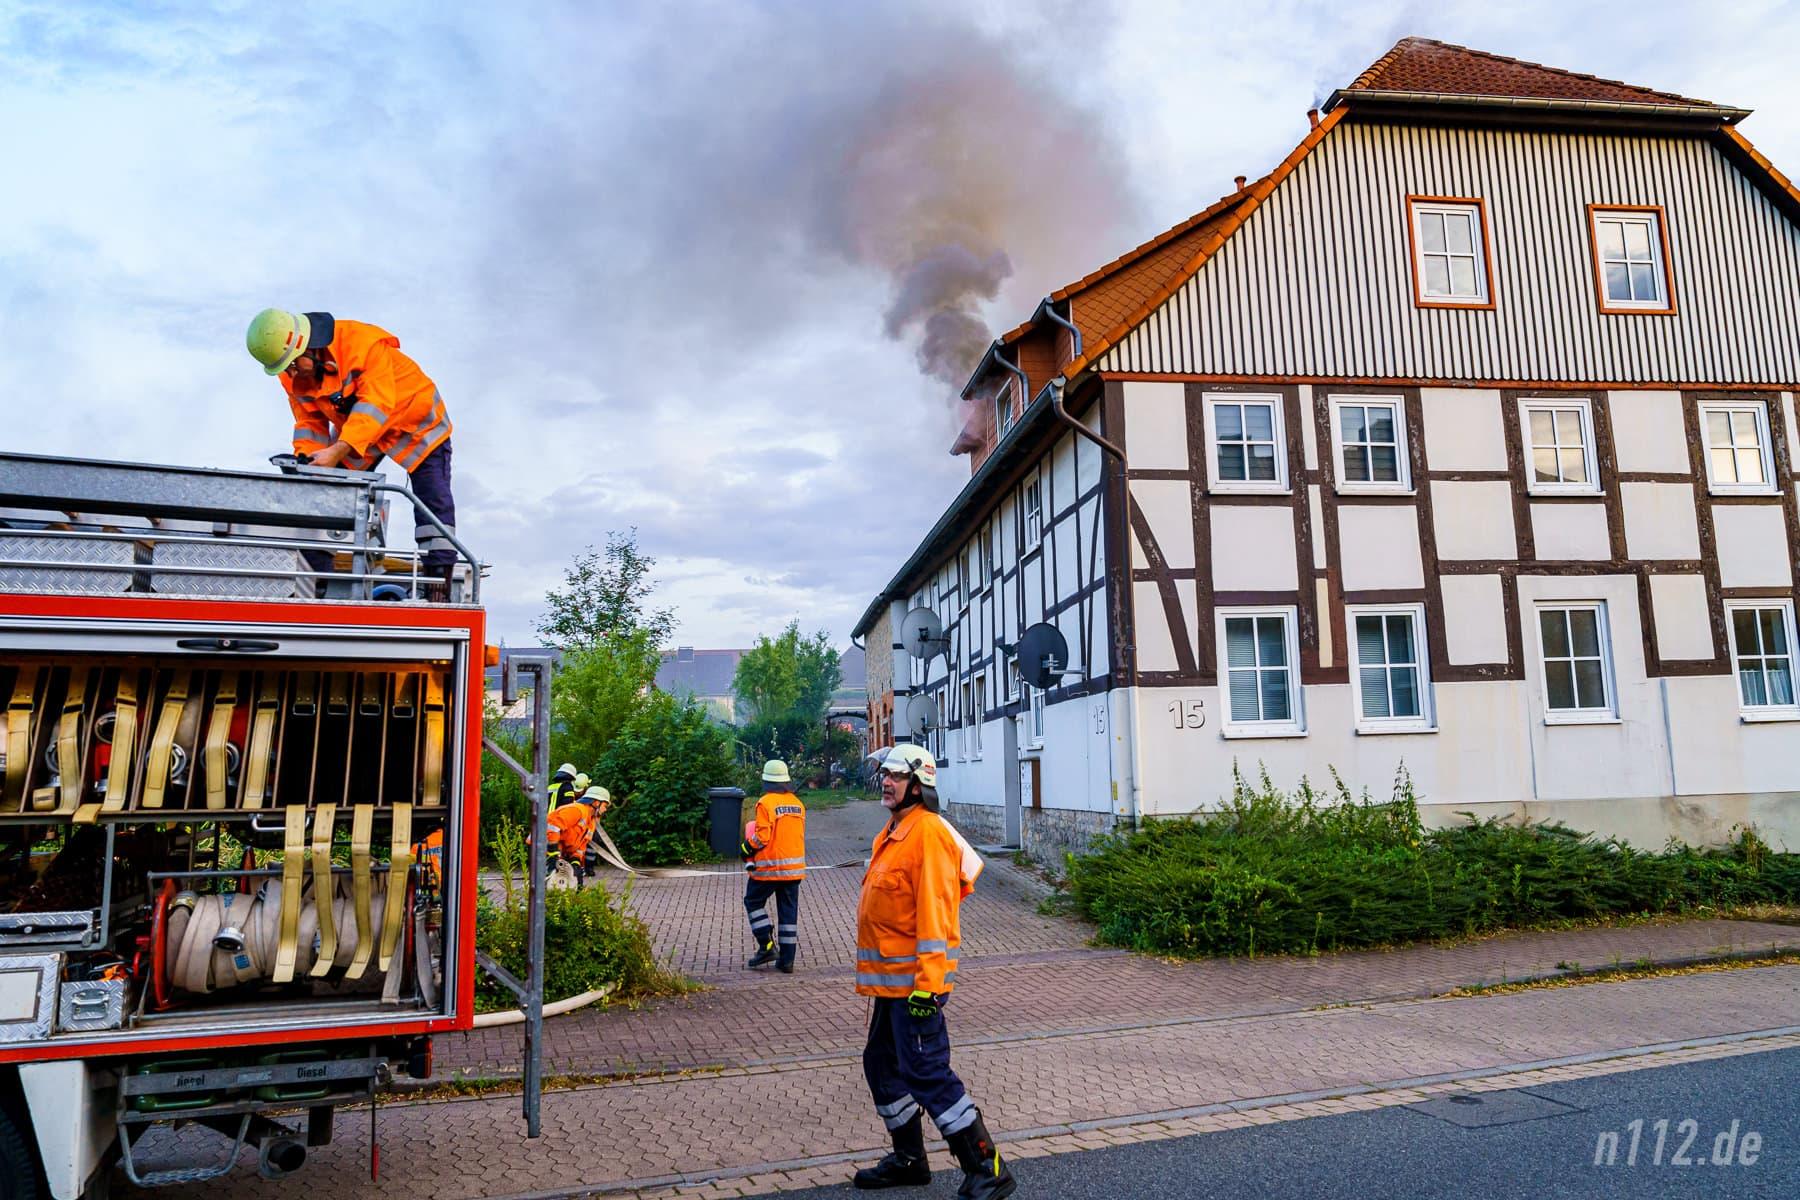 Innerhalb weniger Minuten wurde ein erster Löschangriff aufgebaut (Foto: n112.de/Stefan Simonsen)